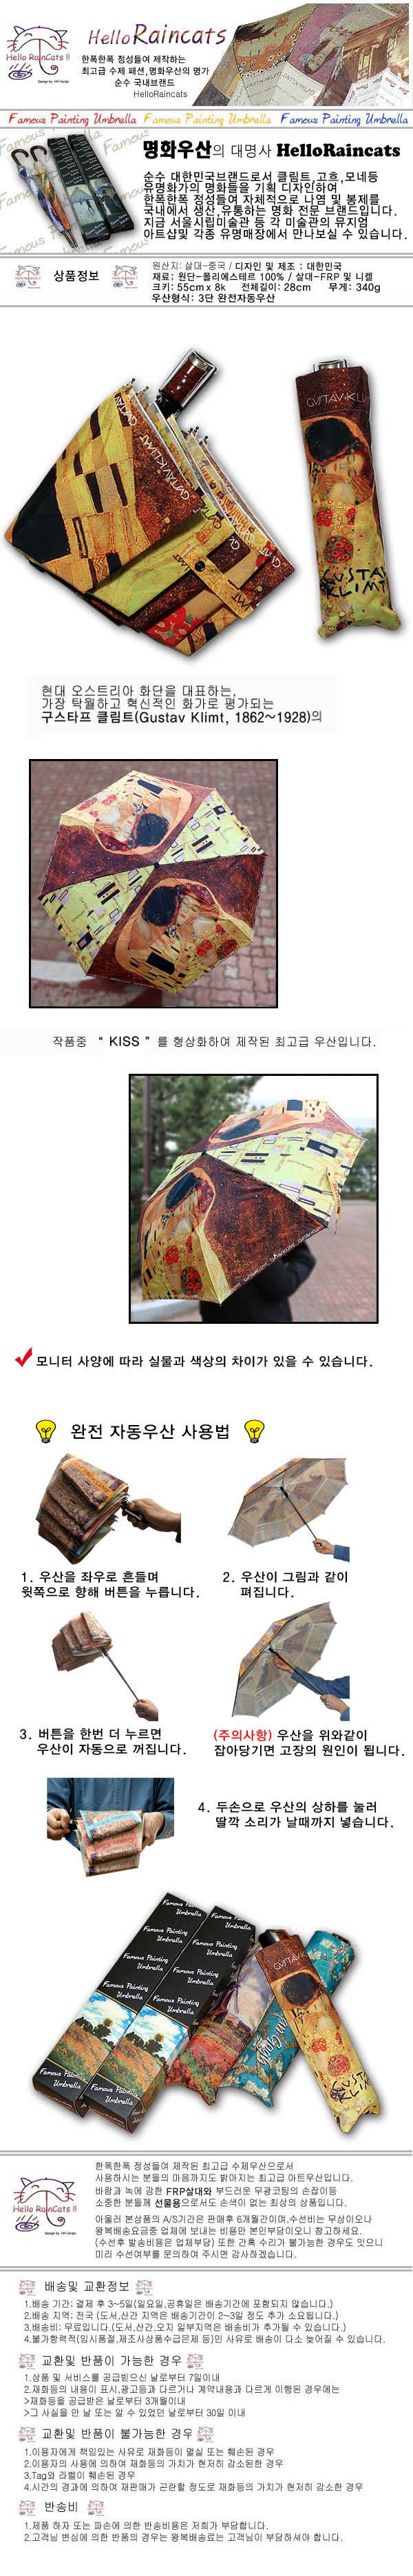 HelloRaincats 클림트_키스 3단완전자동우산 - 헬로우래인캣, 38,500원, 우산, 자동3단/5단우산